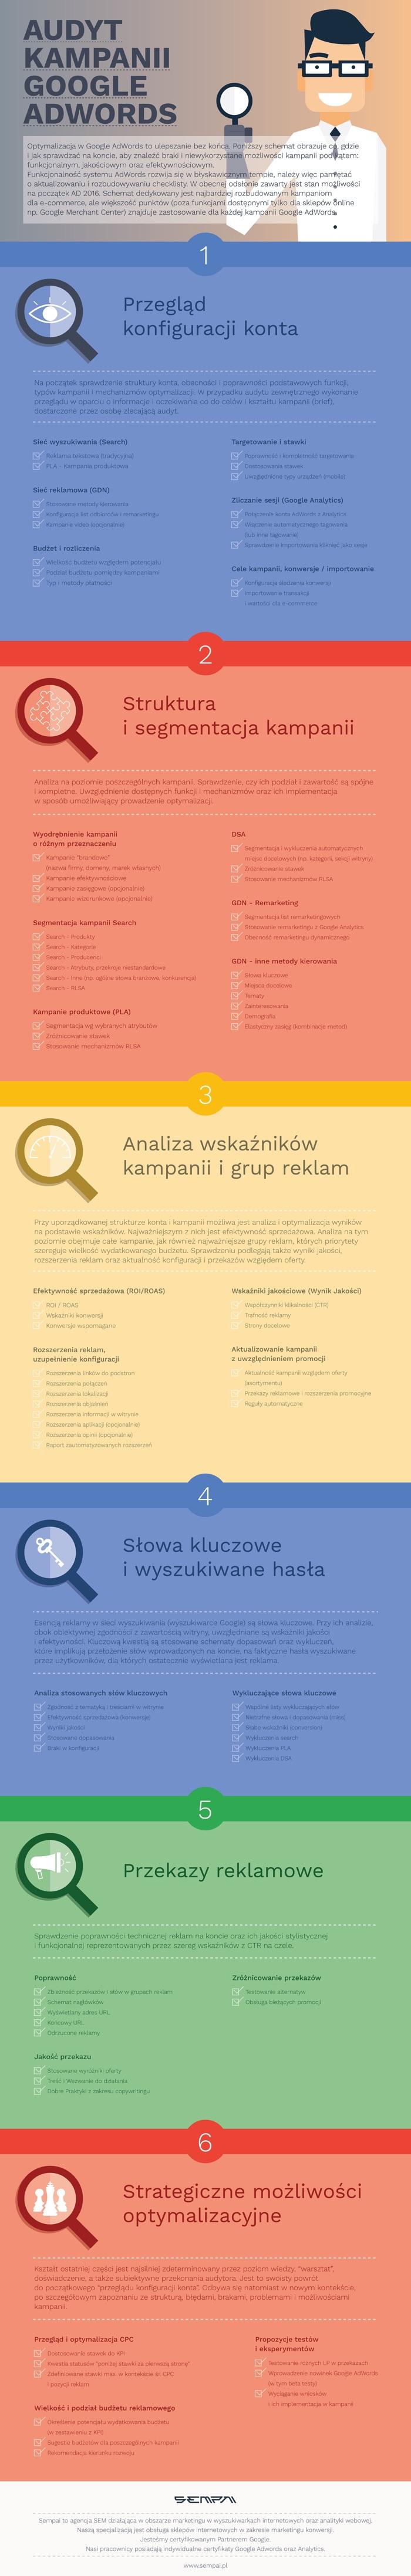 sempai-google-adwords-infografika